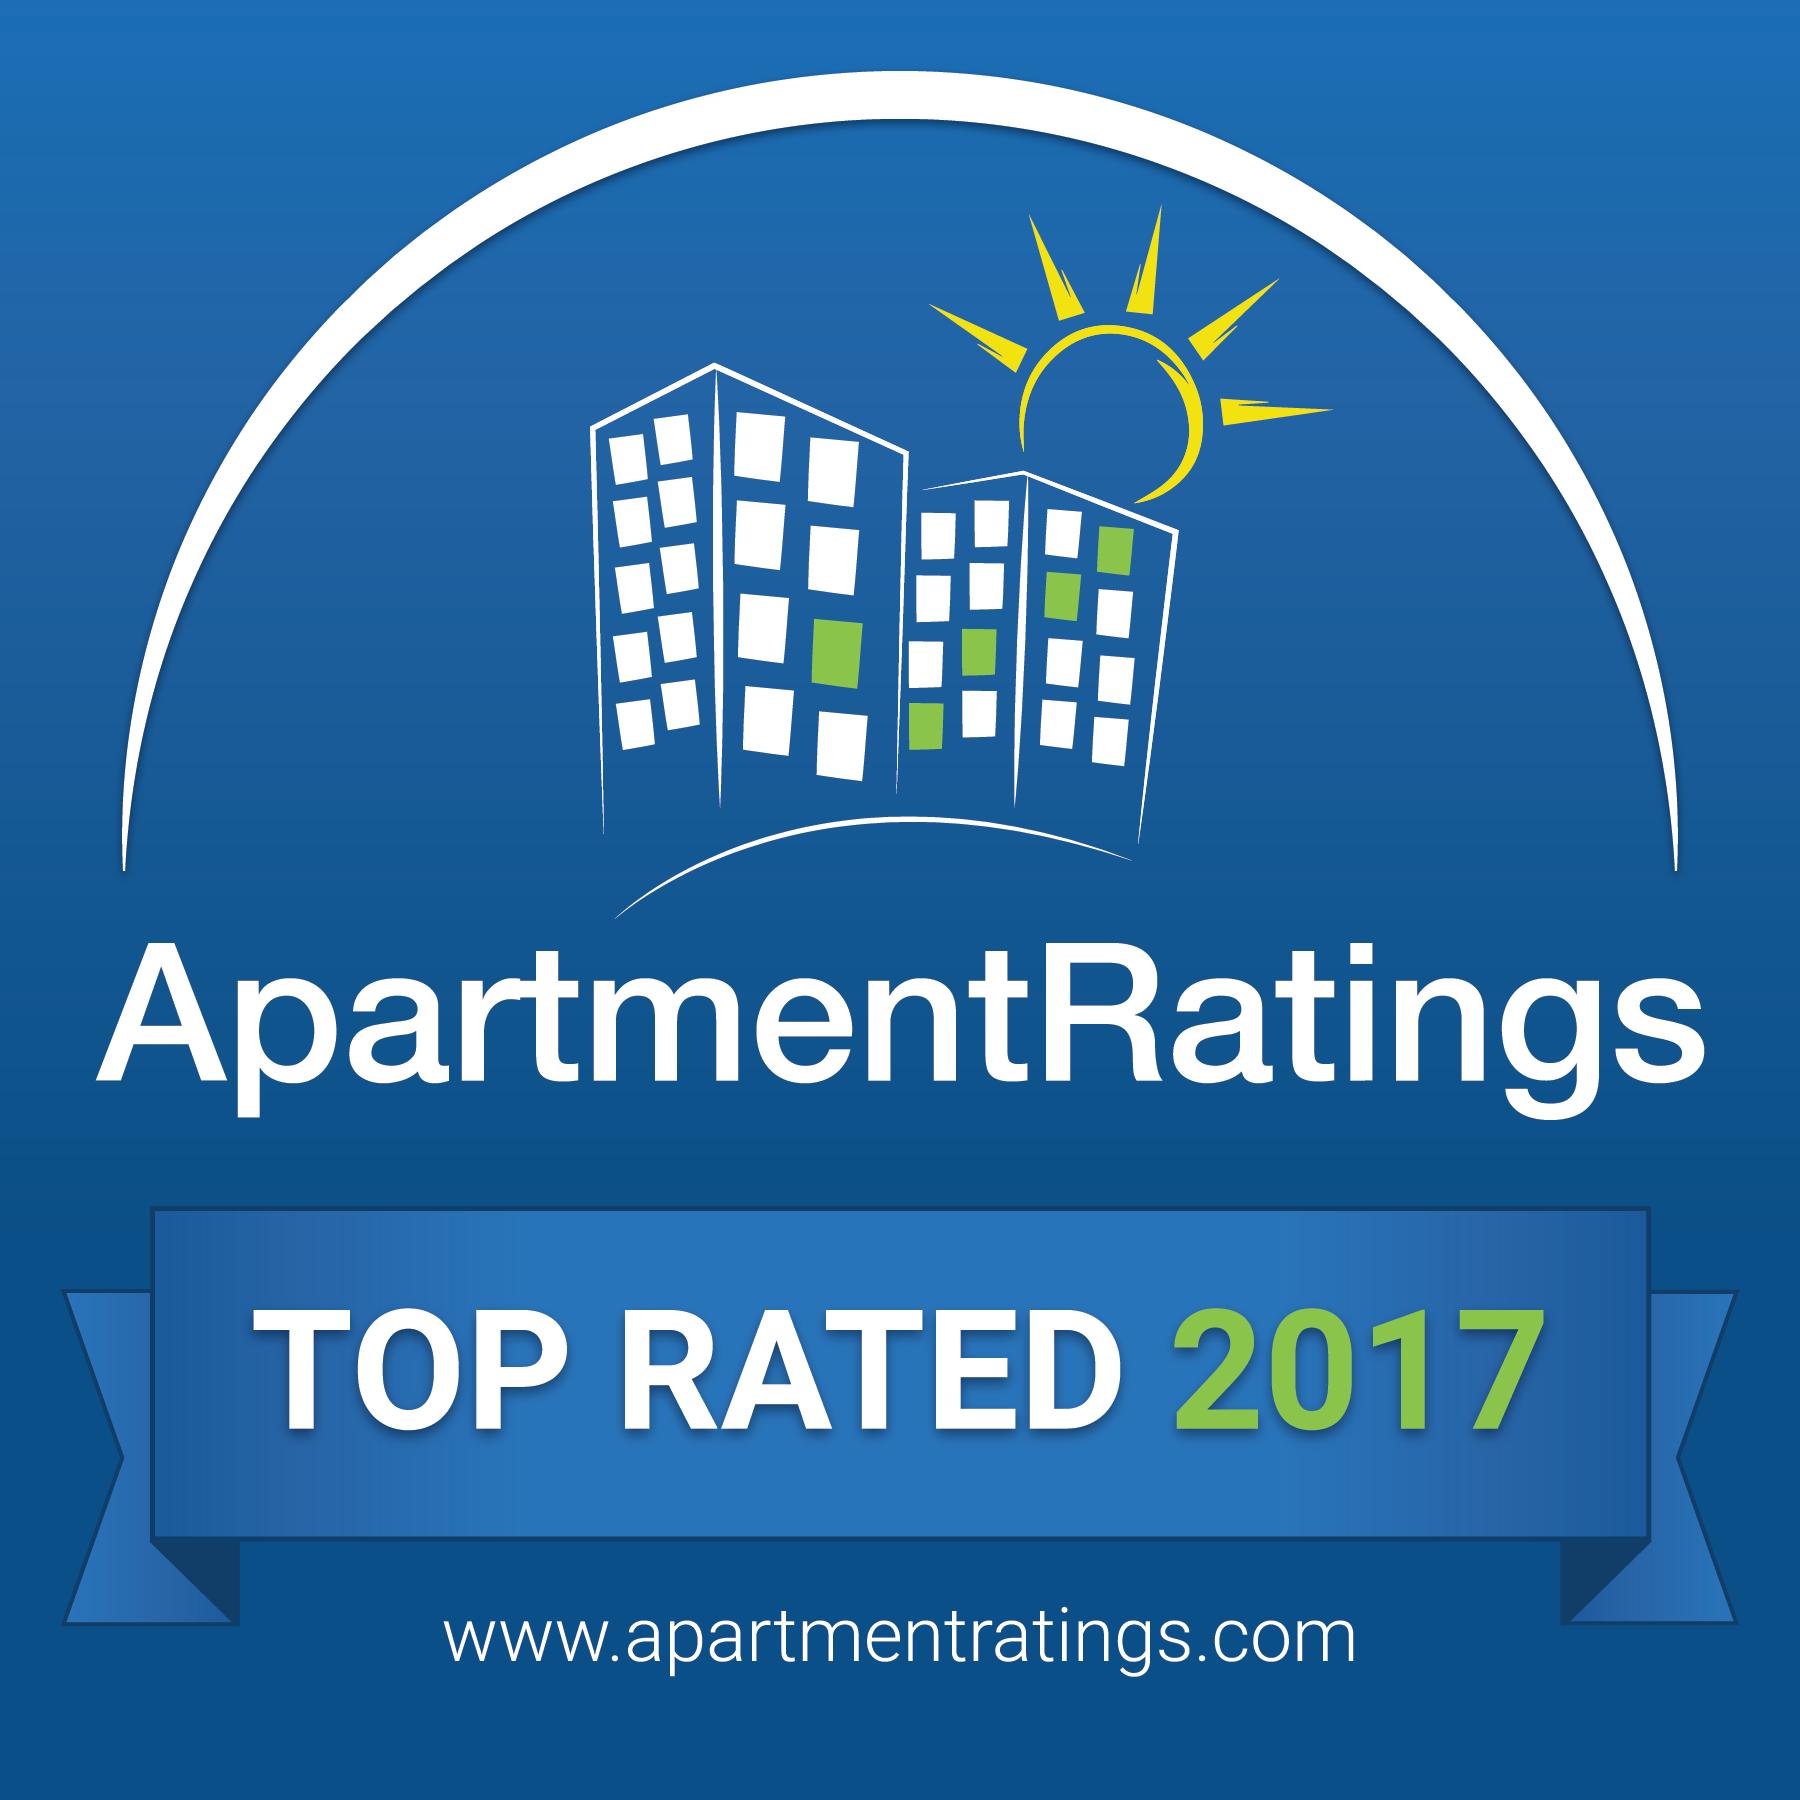 Apartment Ratings 2017 Award Logo.png